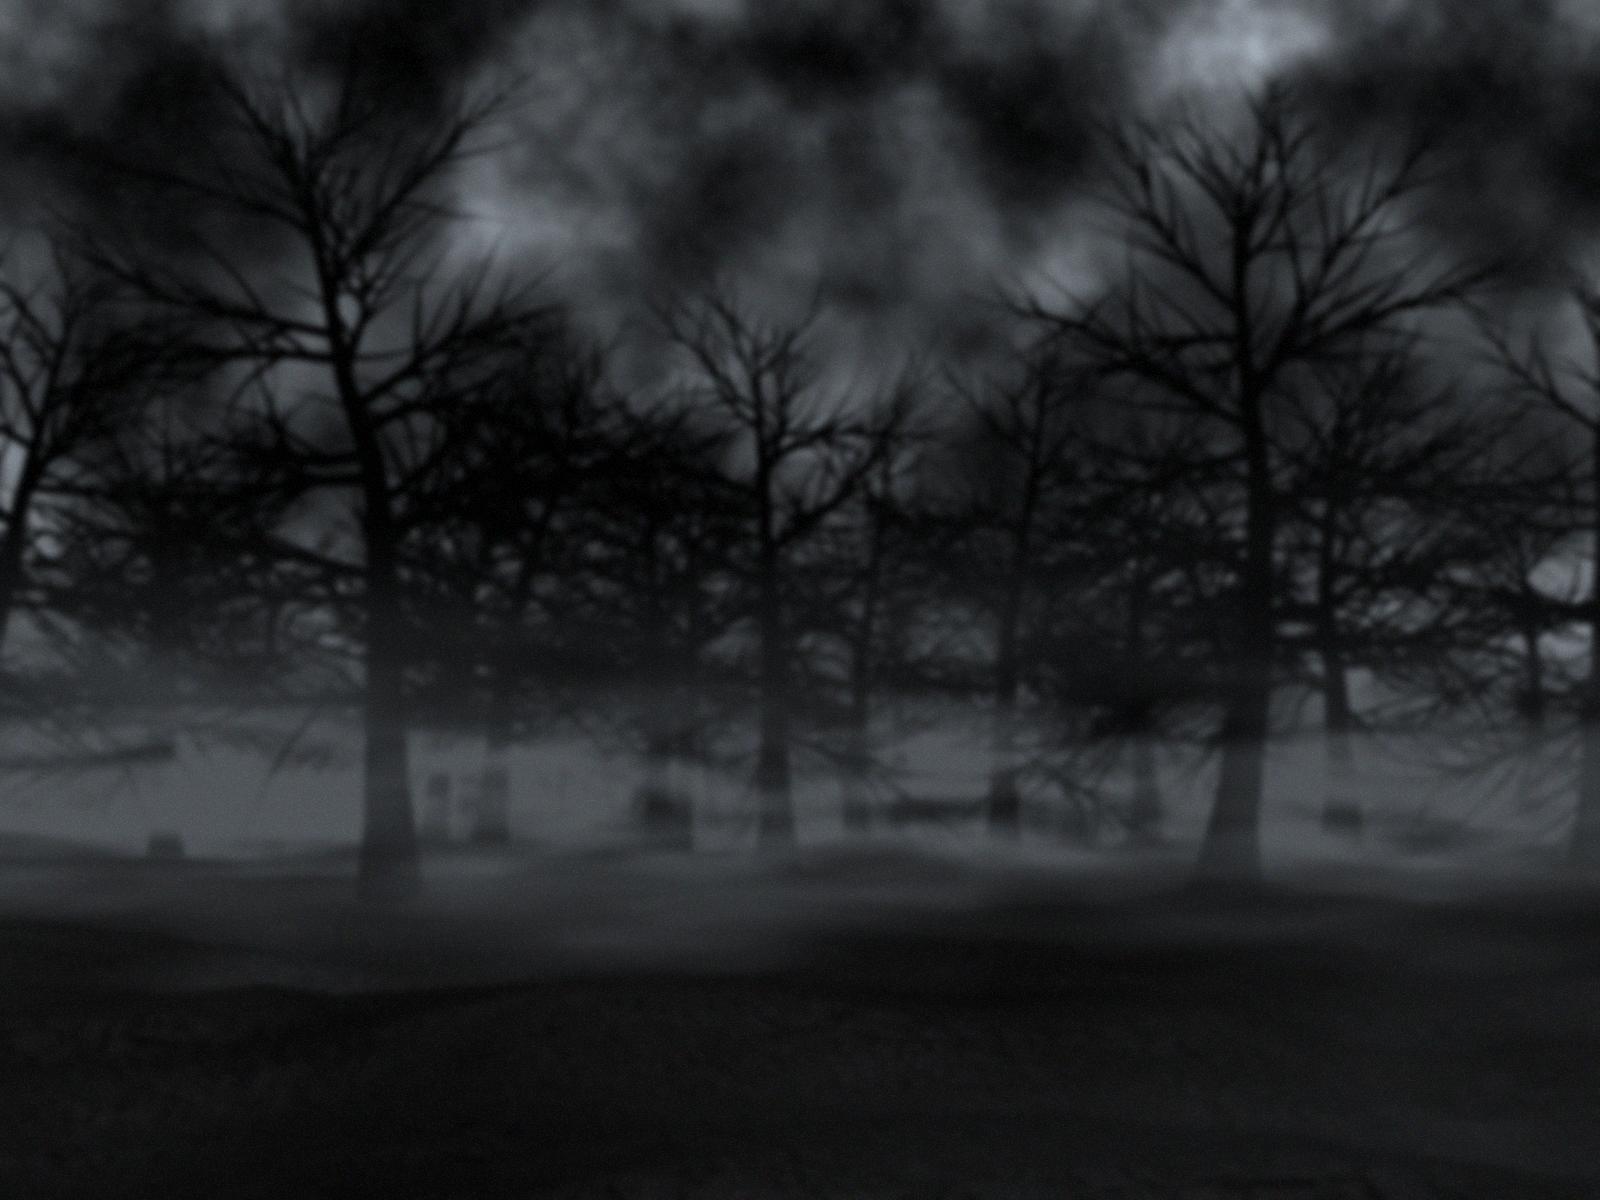 http://4.bp.blogspot.com/-juDmIcvgPUk/T2zQ5JVMYnI/AAAAAAAAAak/k6y2JblNFfs/s1600/darkness.jpg